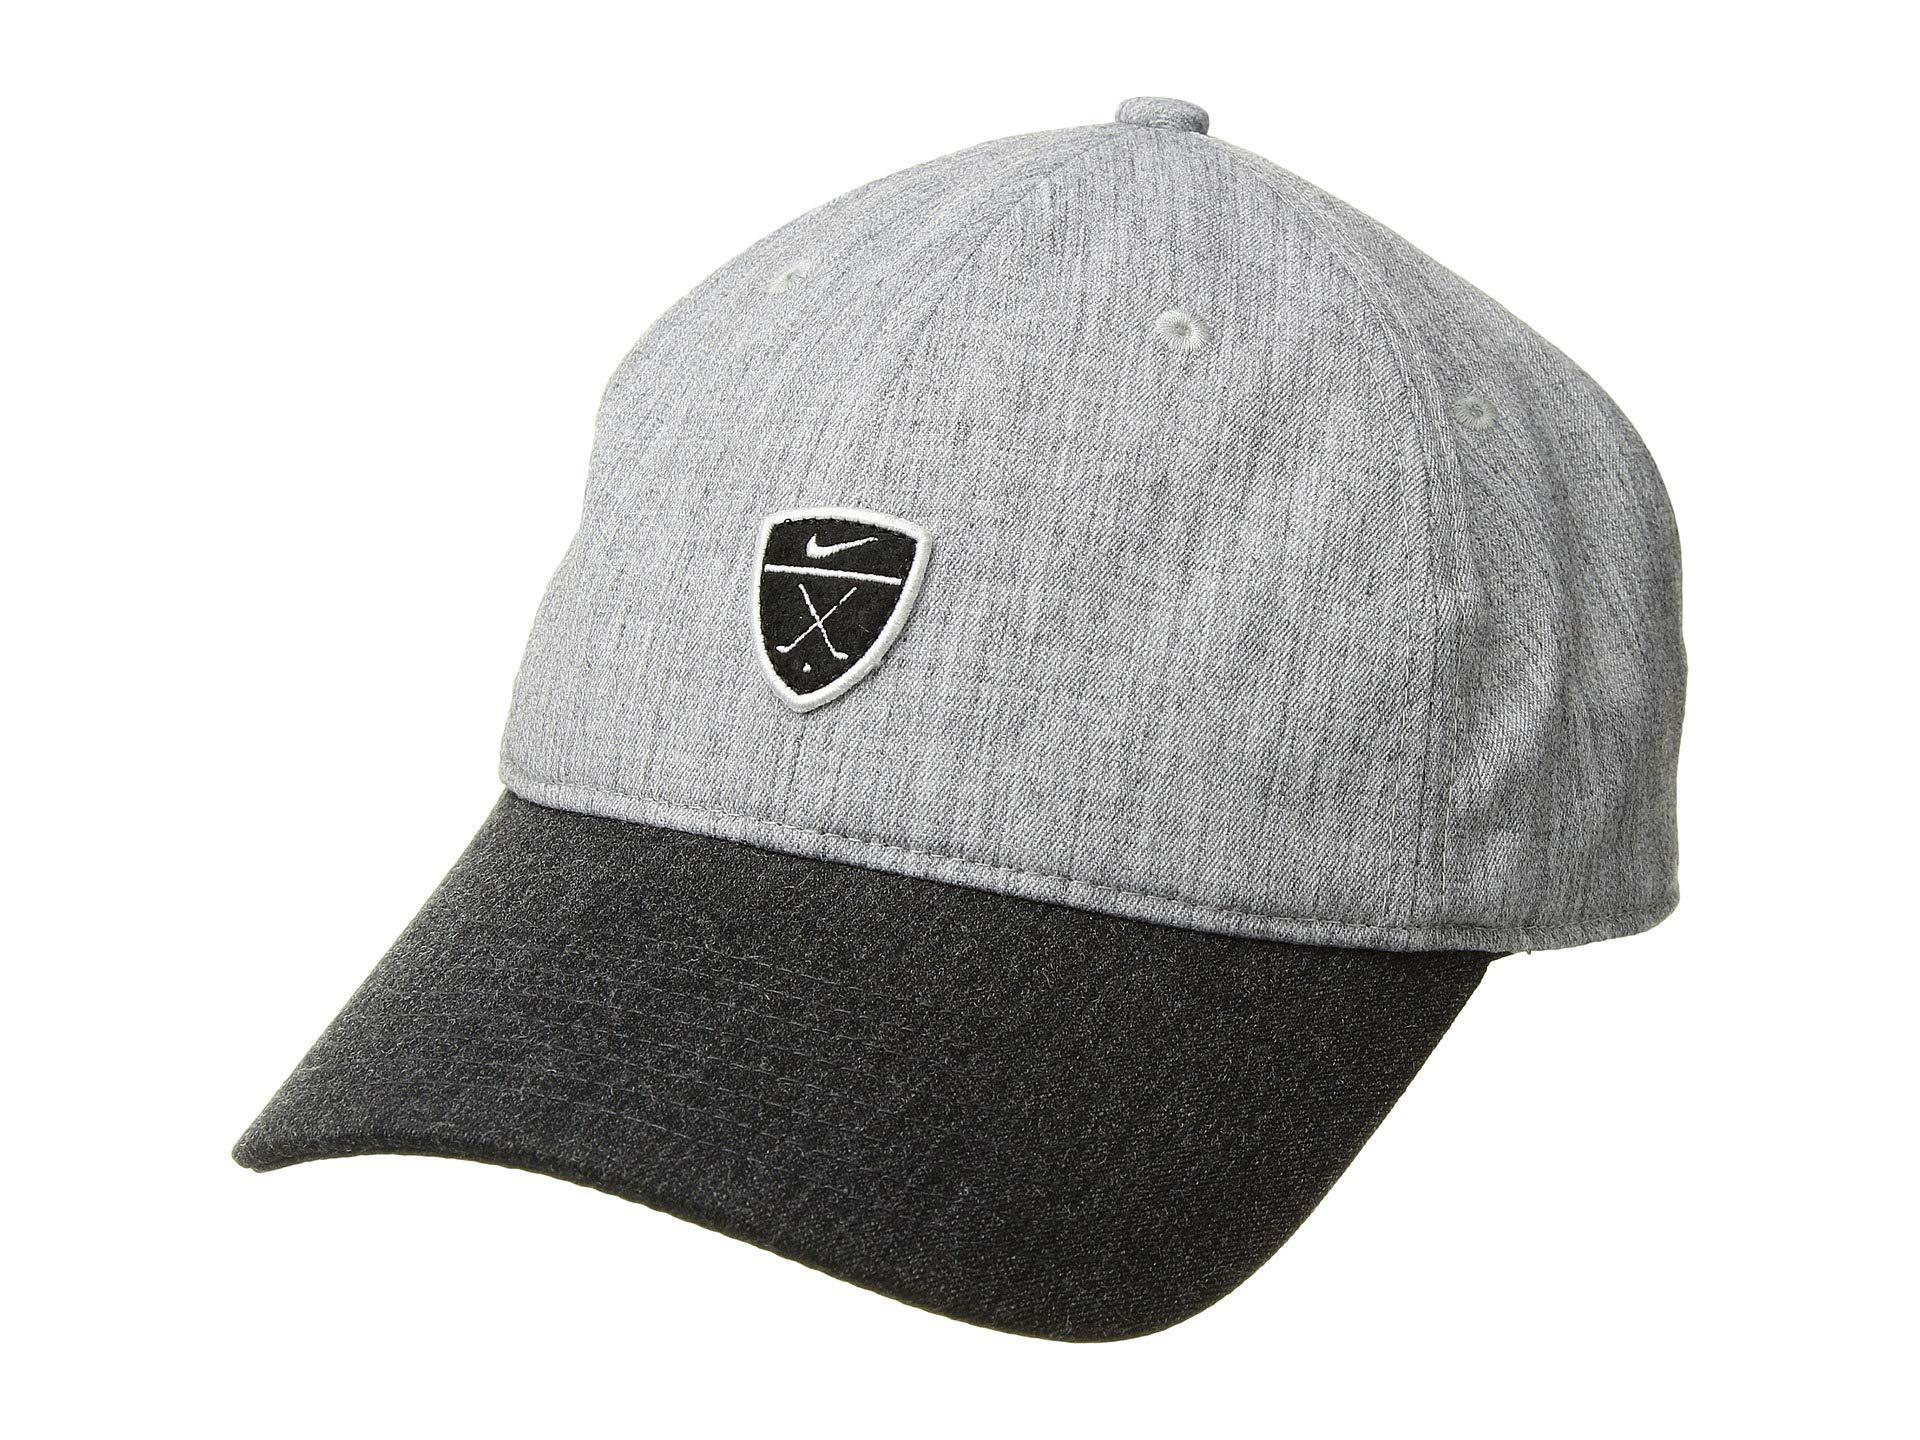 9414b448fb1 Nike. Men s Gray H86 Novelty (charcoal Heather charcoal Heather black) Baseball  Caps